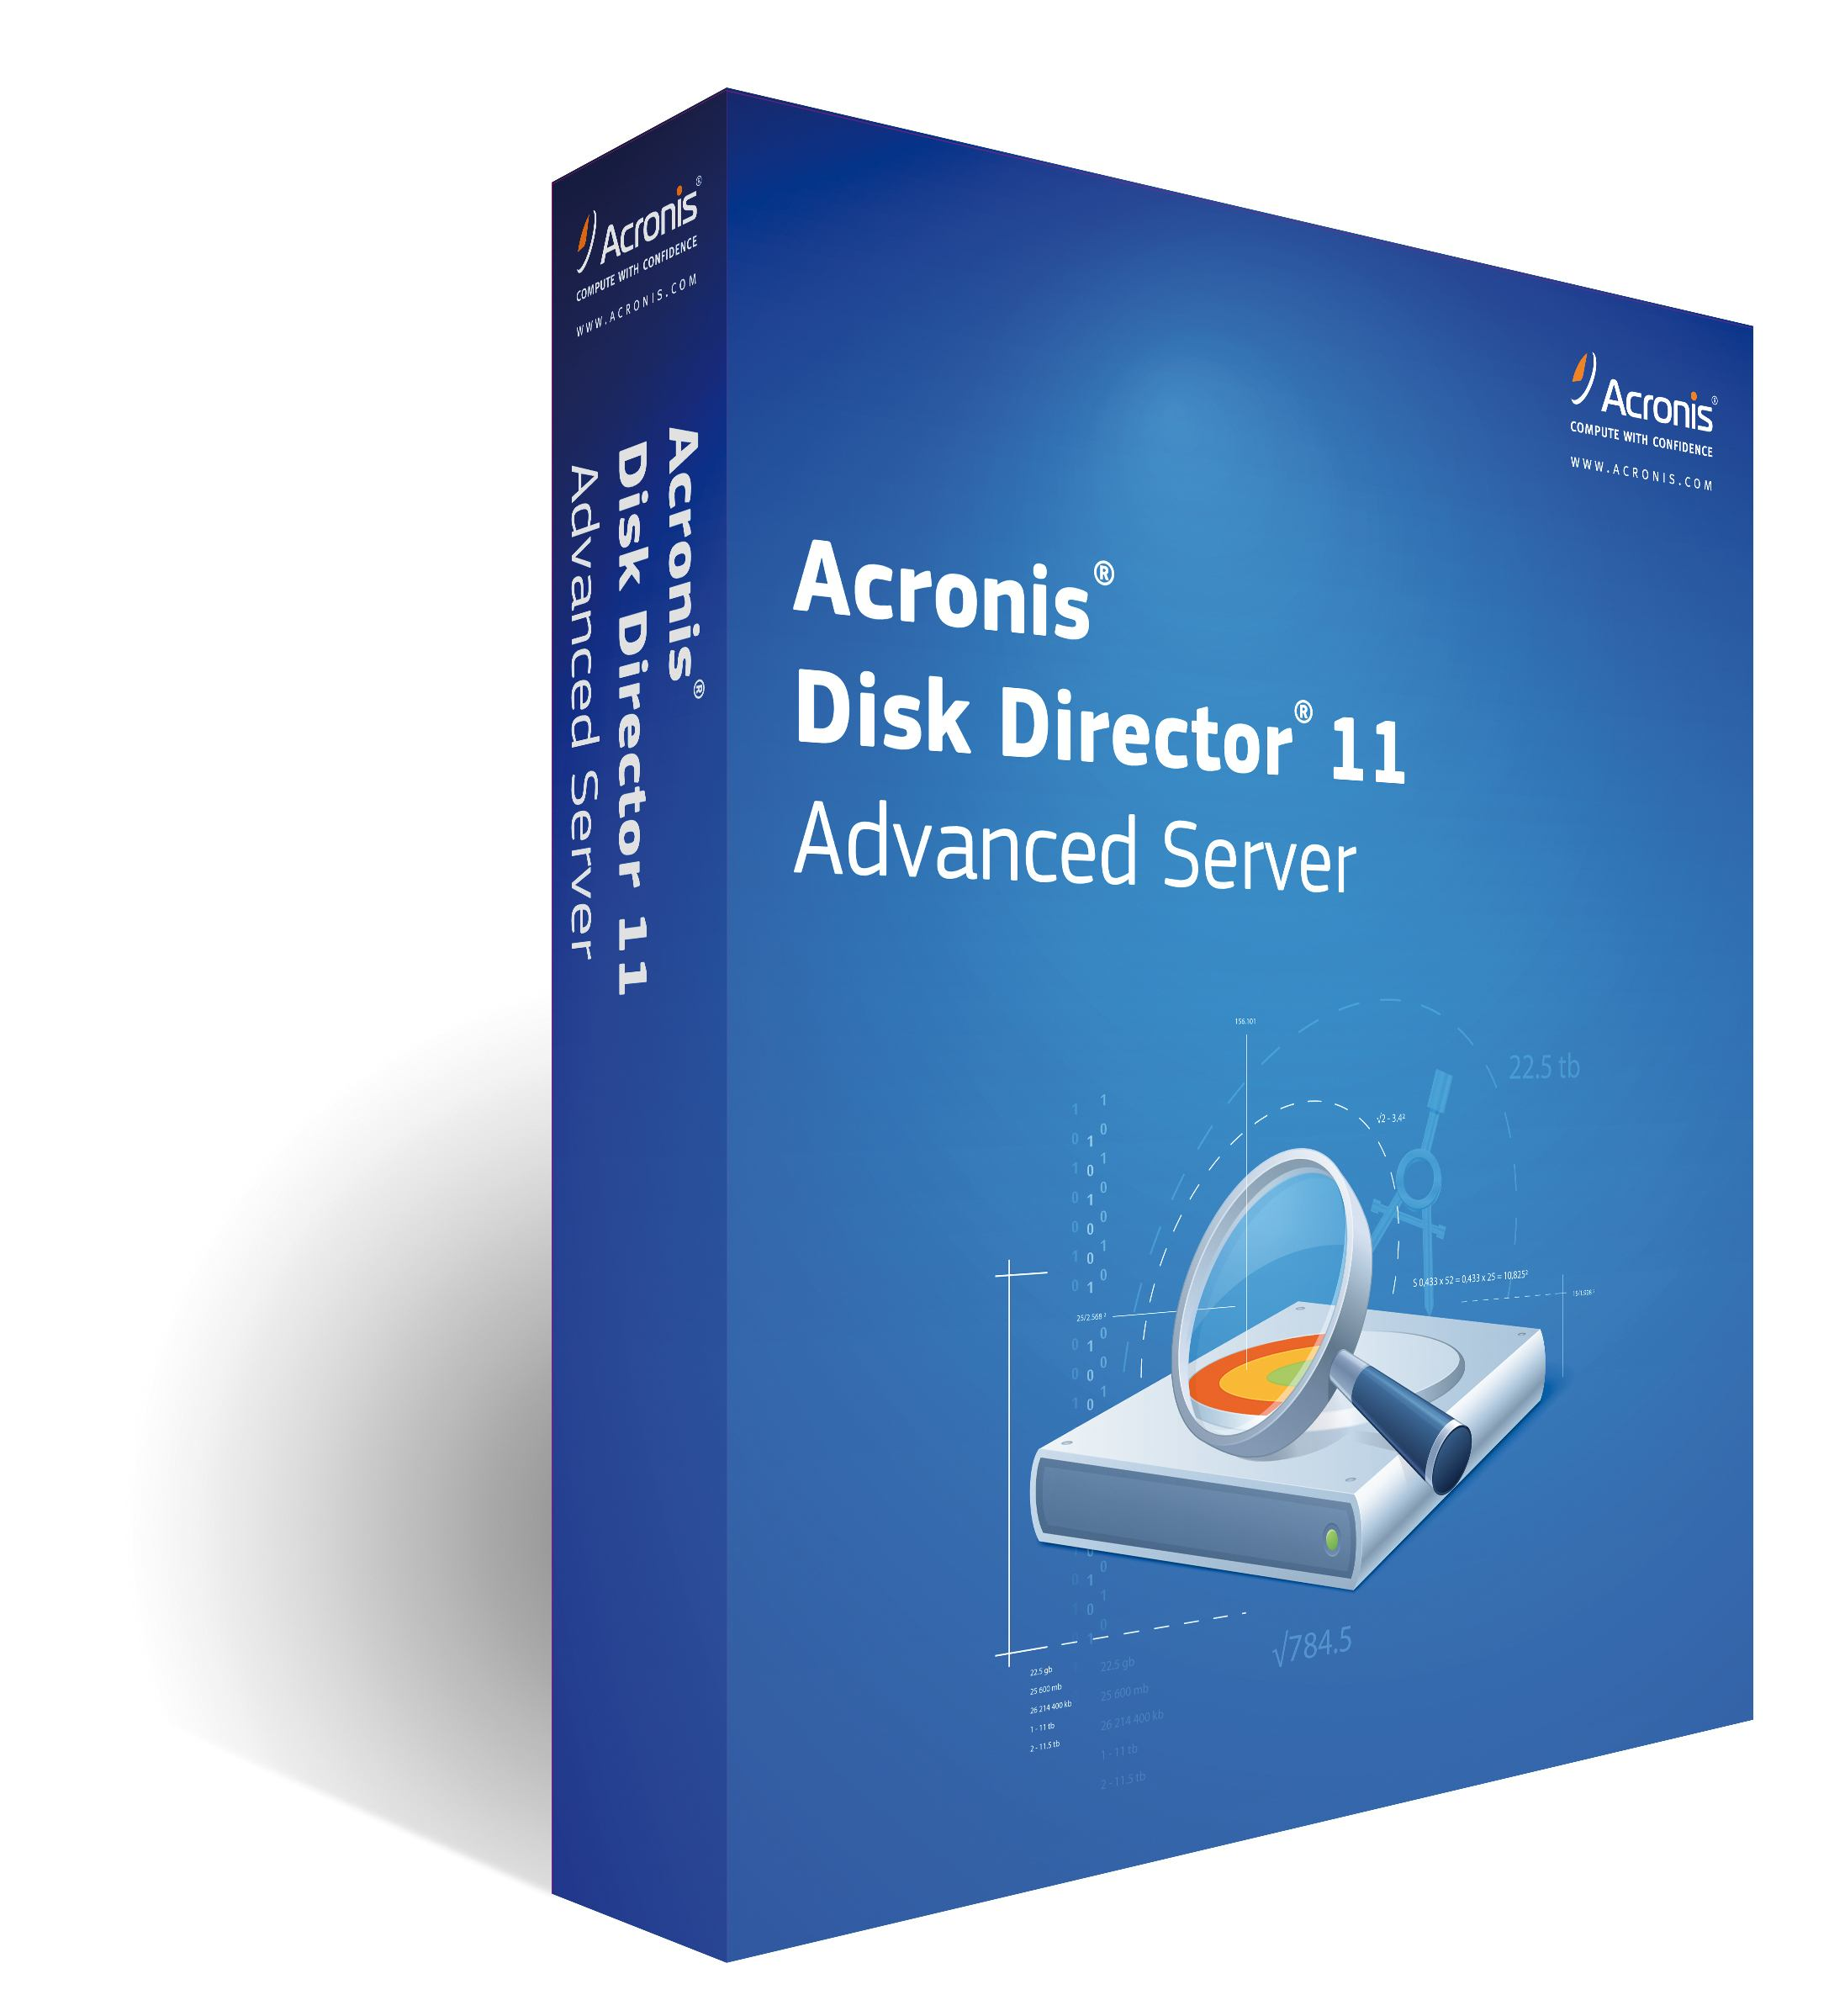 2022026-Acronis-Disk-Director-11-Advanced-Server-Rinnovo-Multilingua-Acronis-Ad